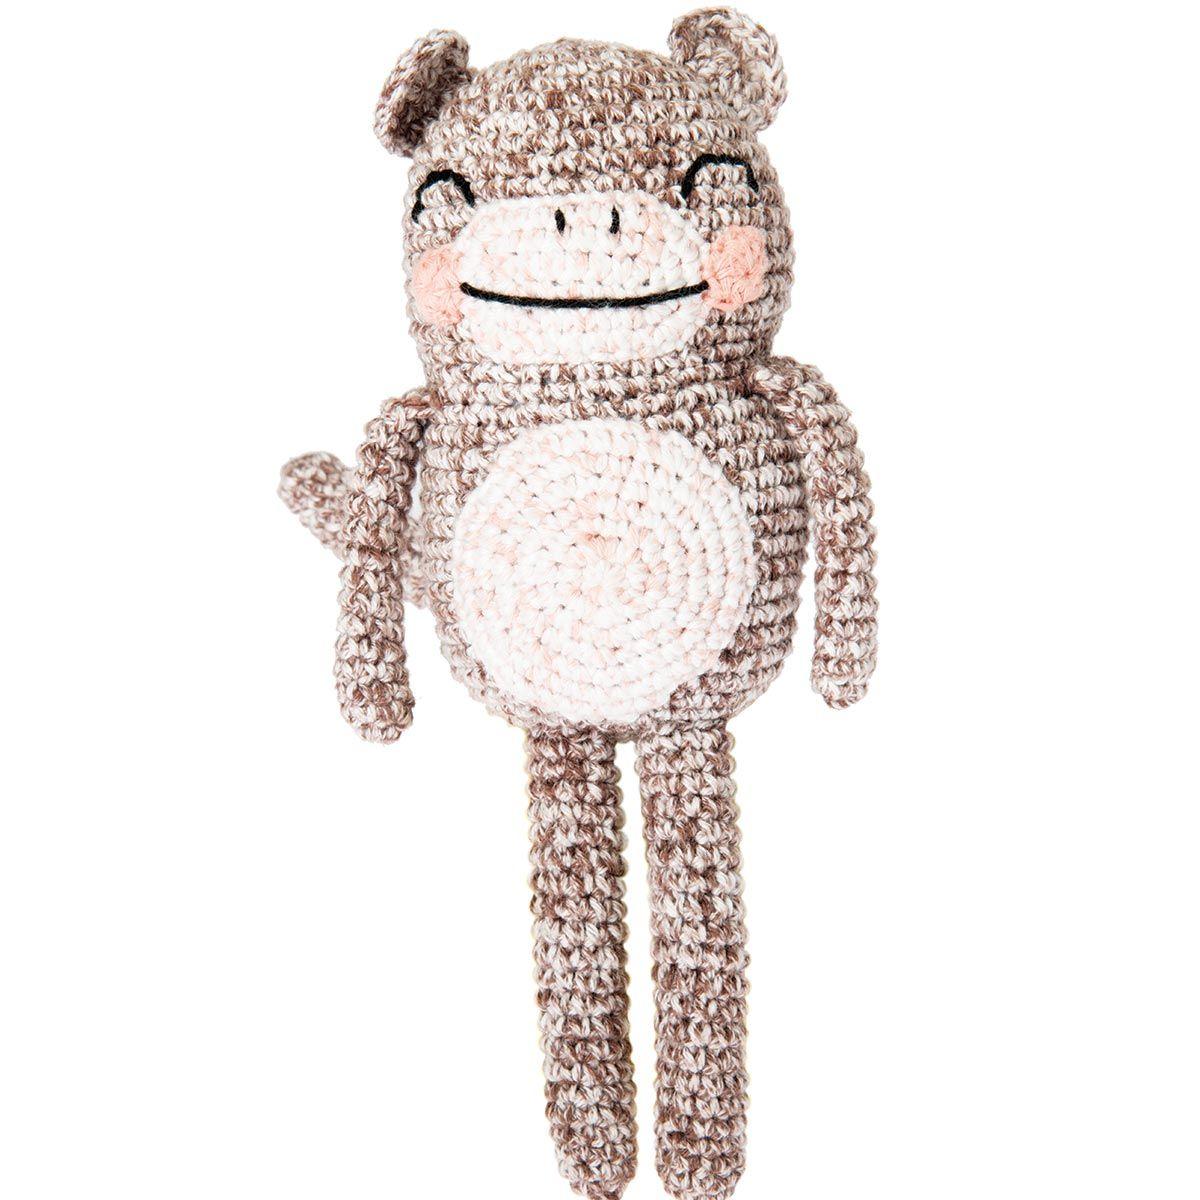 Kit crochet amigurumi - Singe